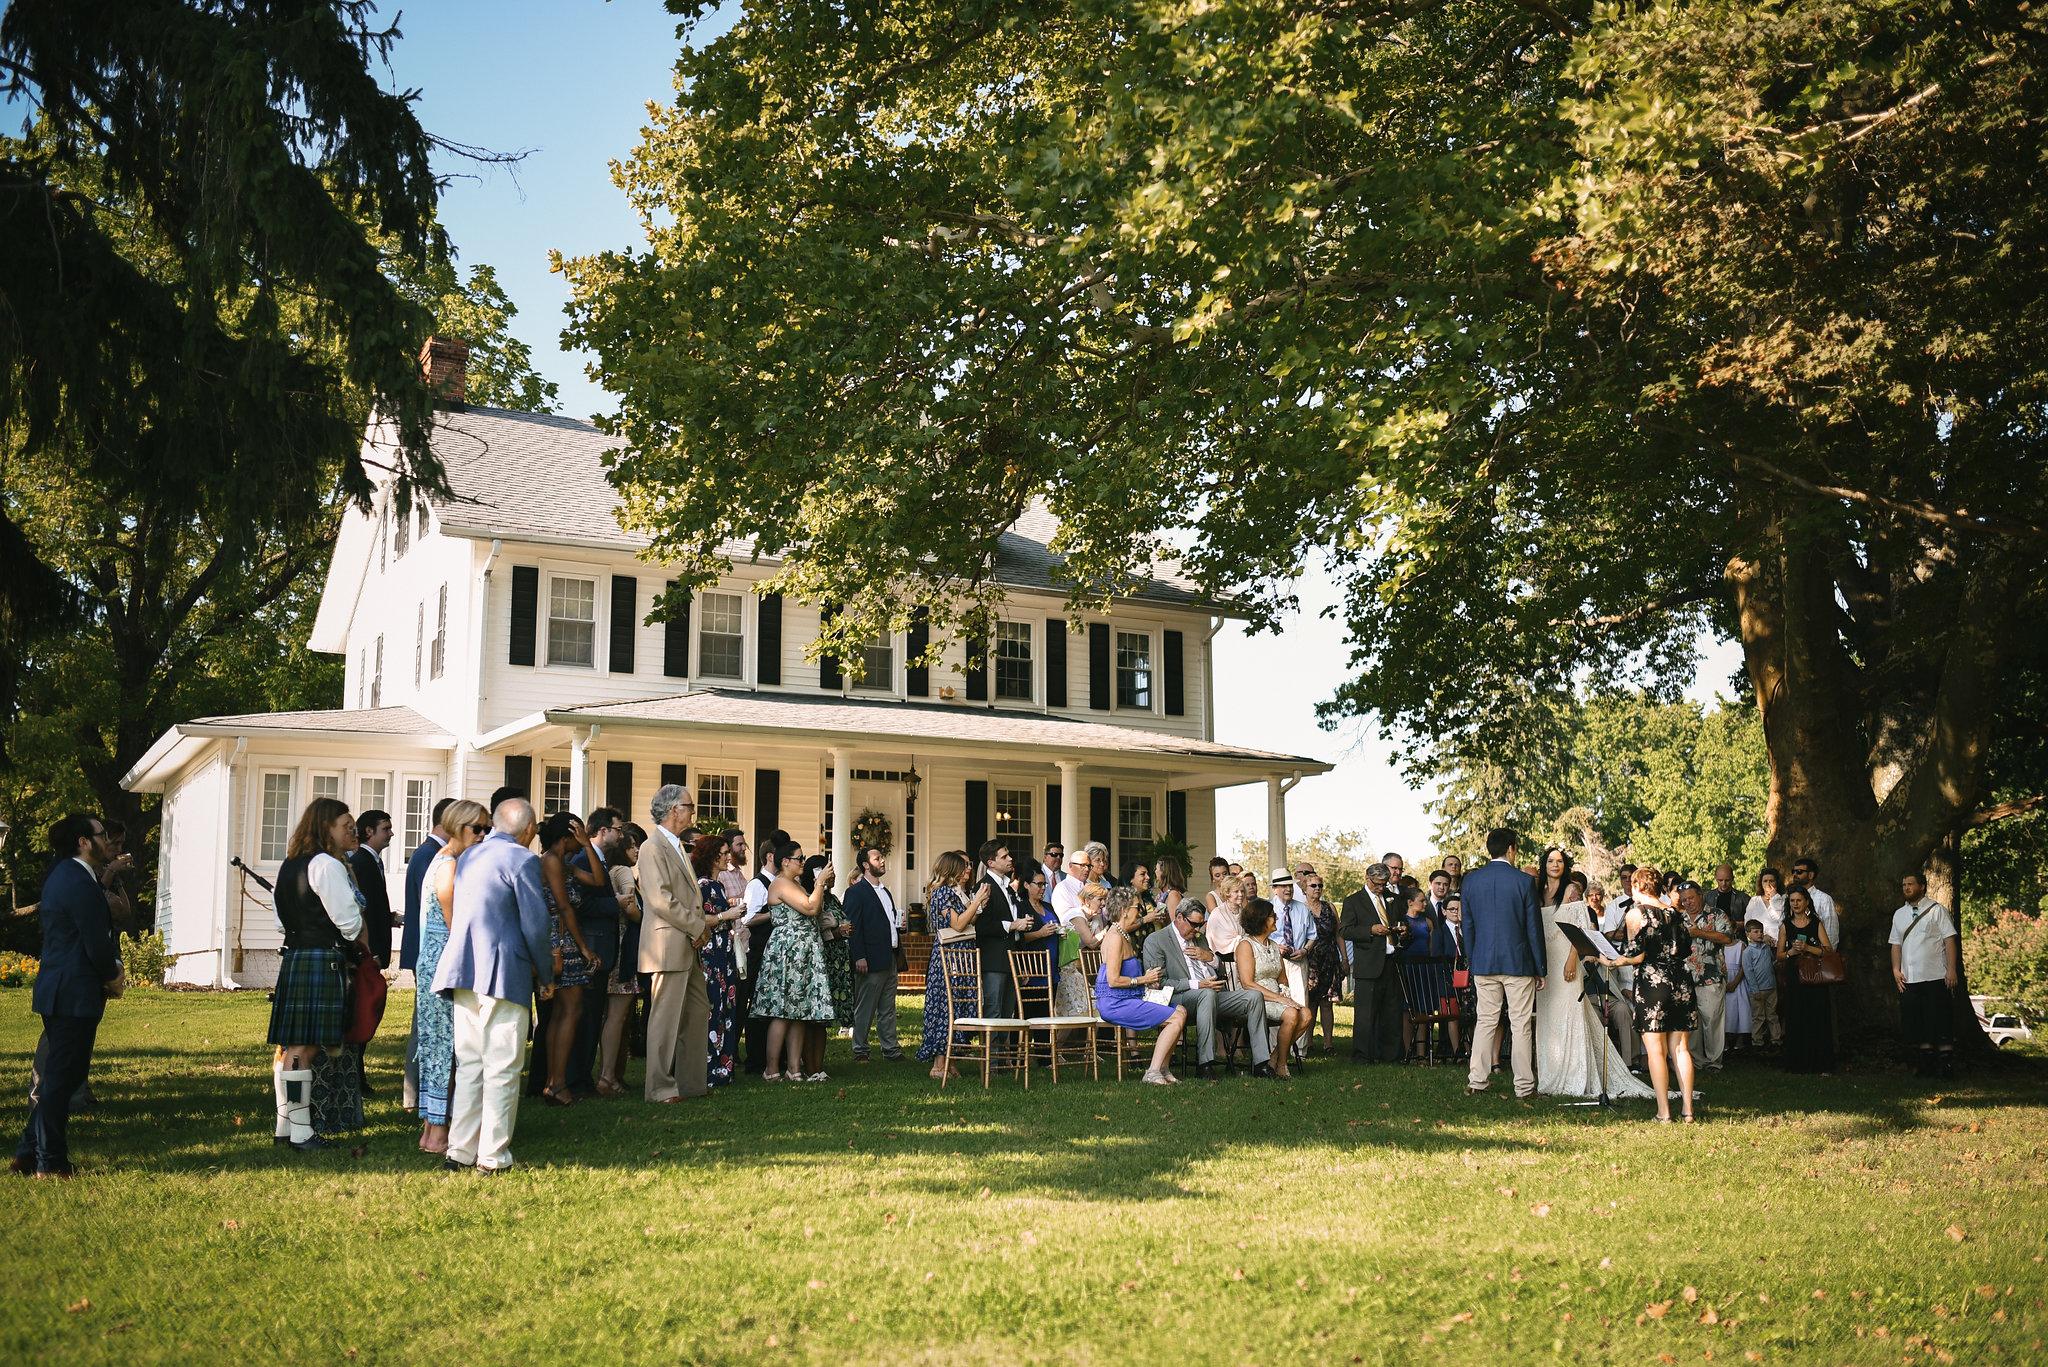 Maryland, Eastern Shore, Baltimore Wedding Photographer, Romantic, Boho, Backyard Wedding, Nature, Guests Gathered in Backyard for Ceremony